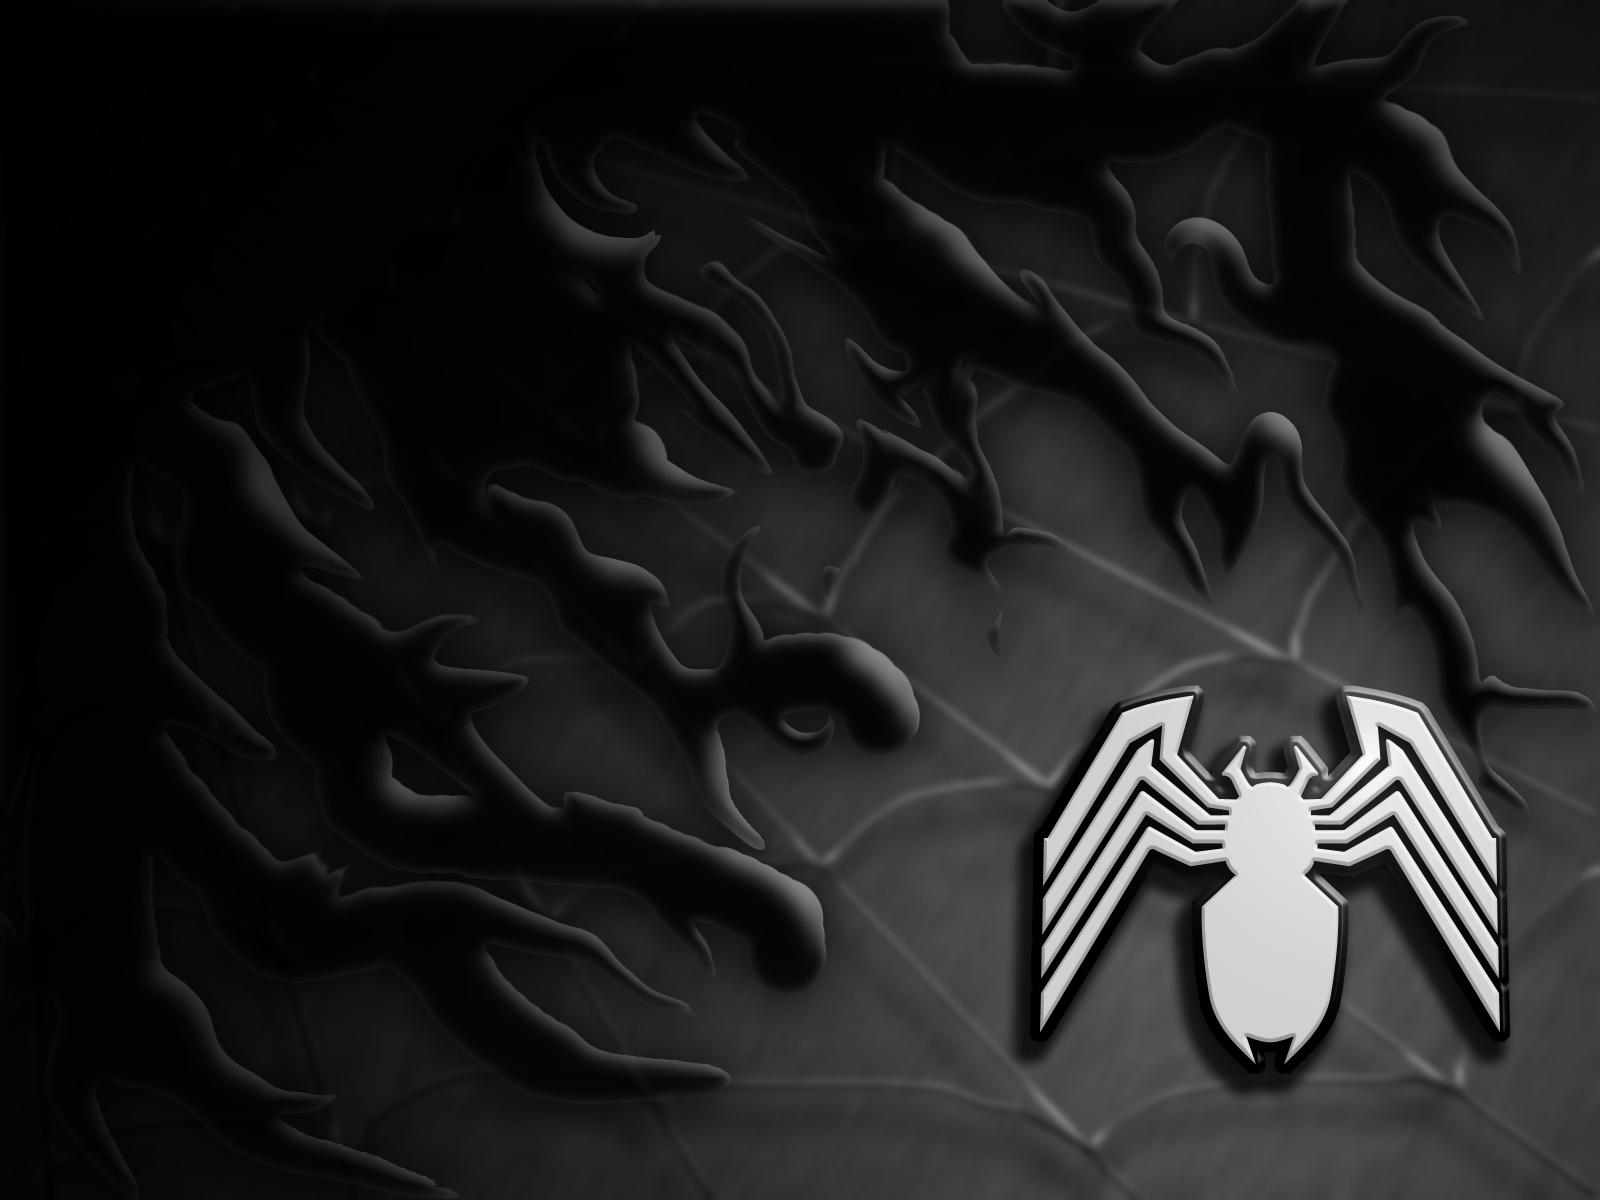 Venom Symbol   Comics Photography Desktop Wallpapers 4023 Views 1600x1200